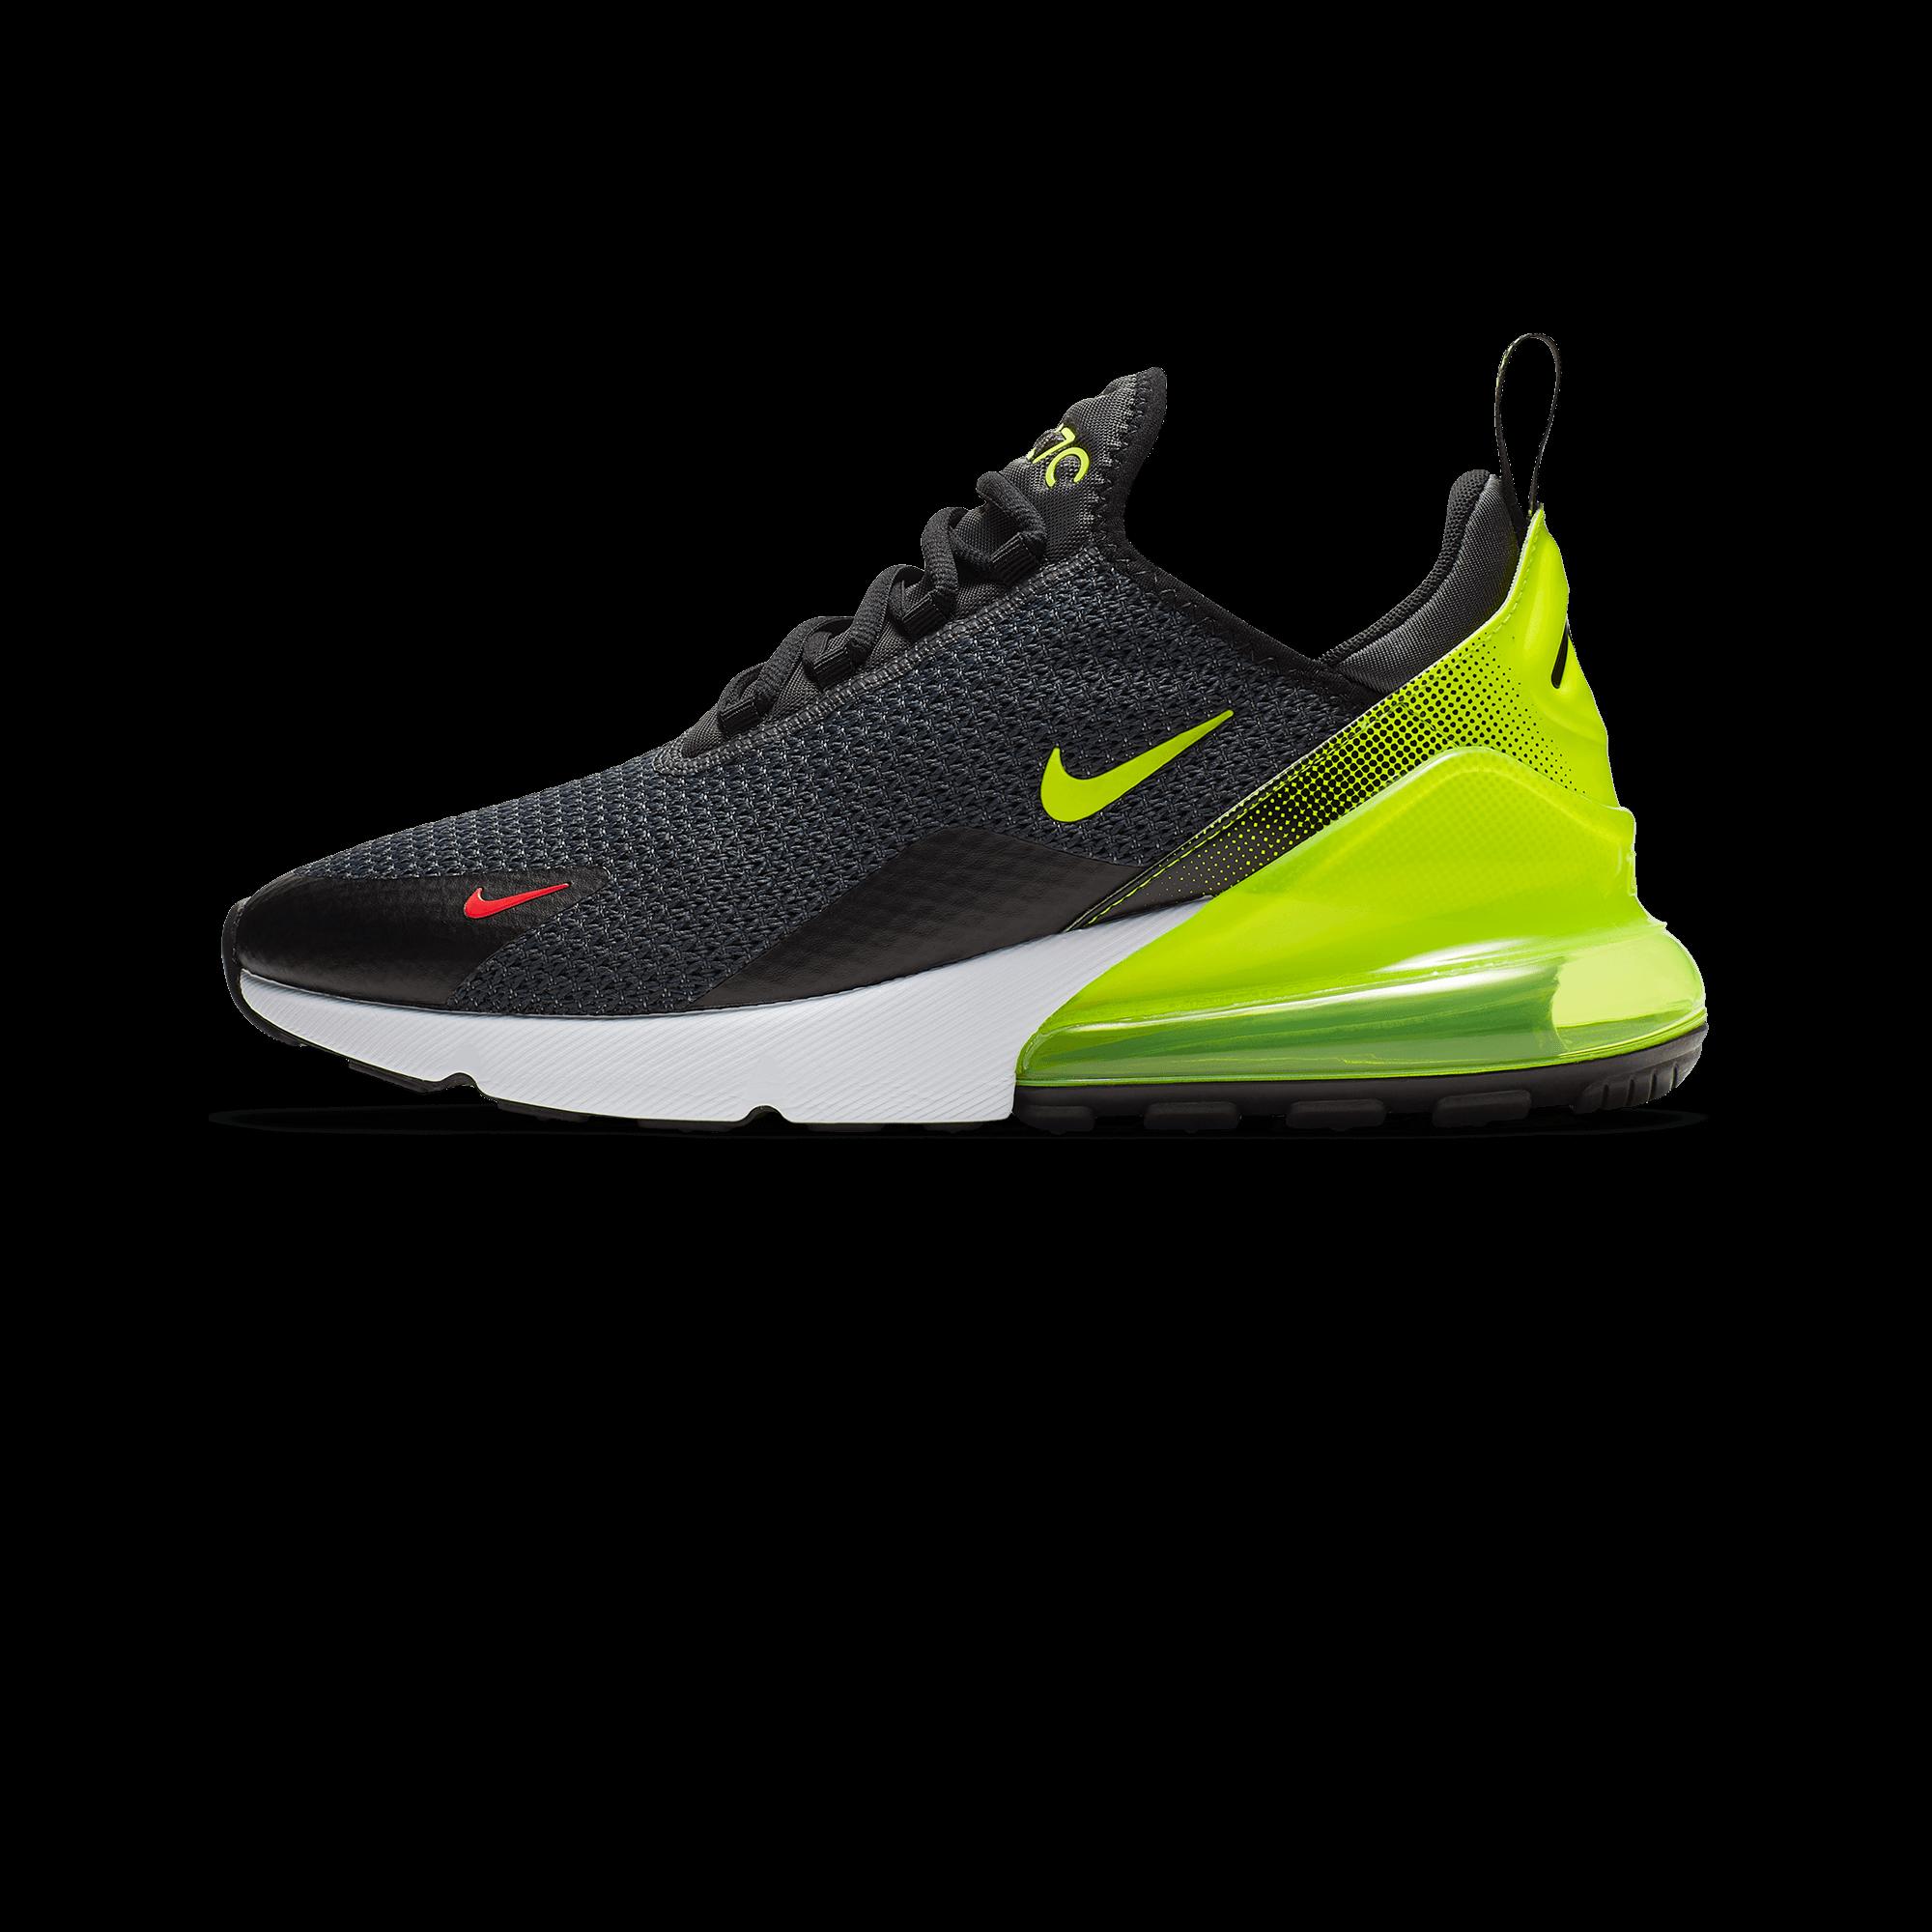 reputable site 21941 2127d Nike Air Max 270 SE black / anthracite / bright crimson - Men |  Holypopstore.com